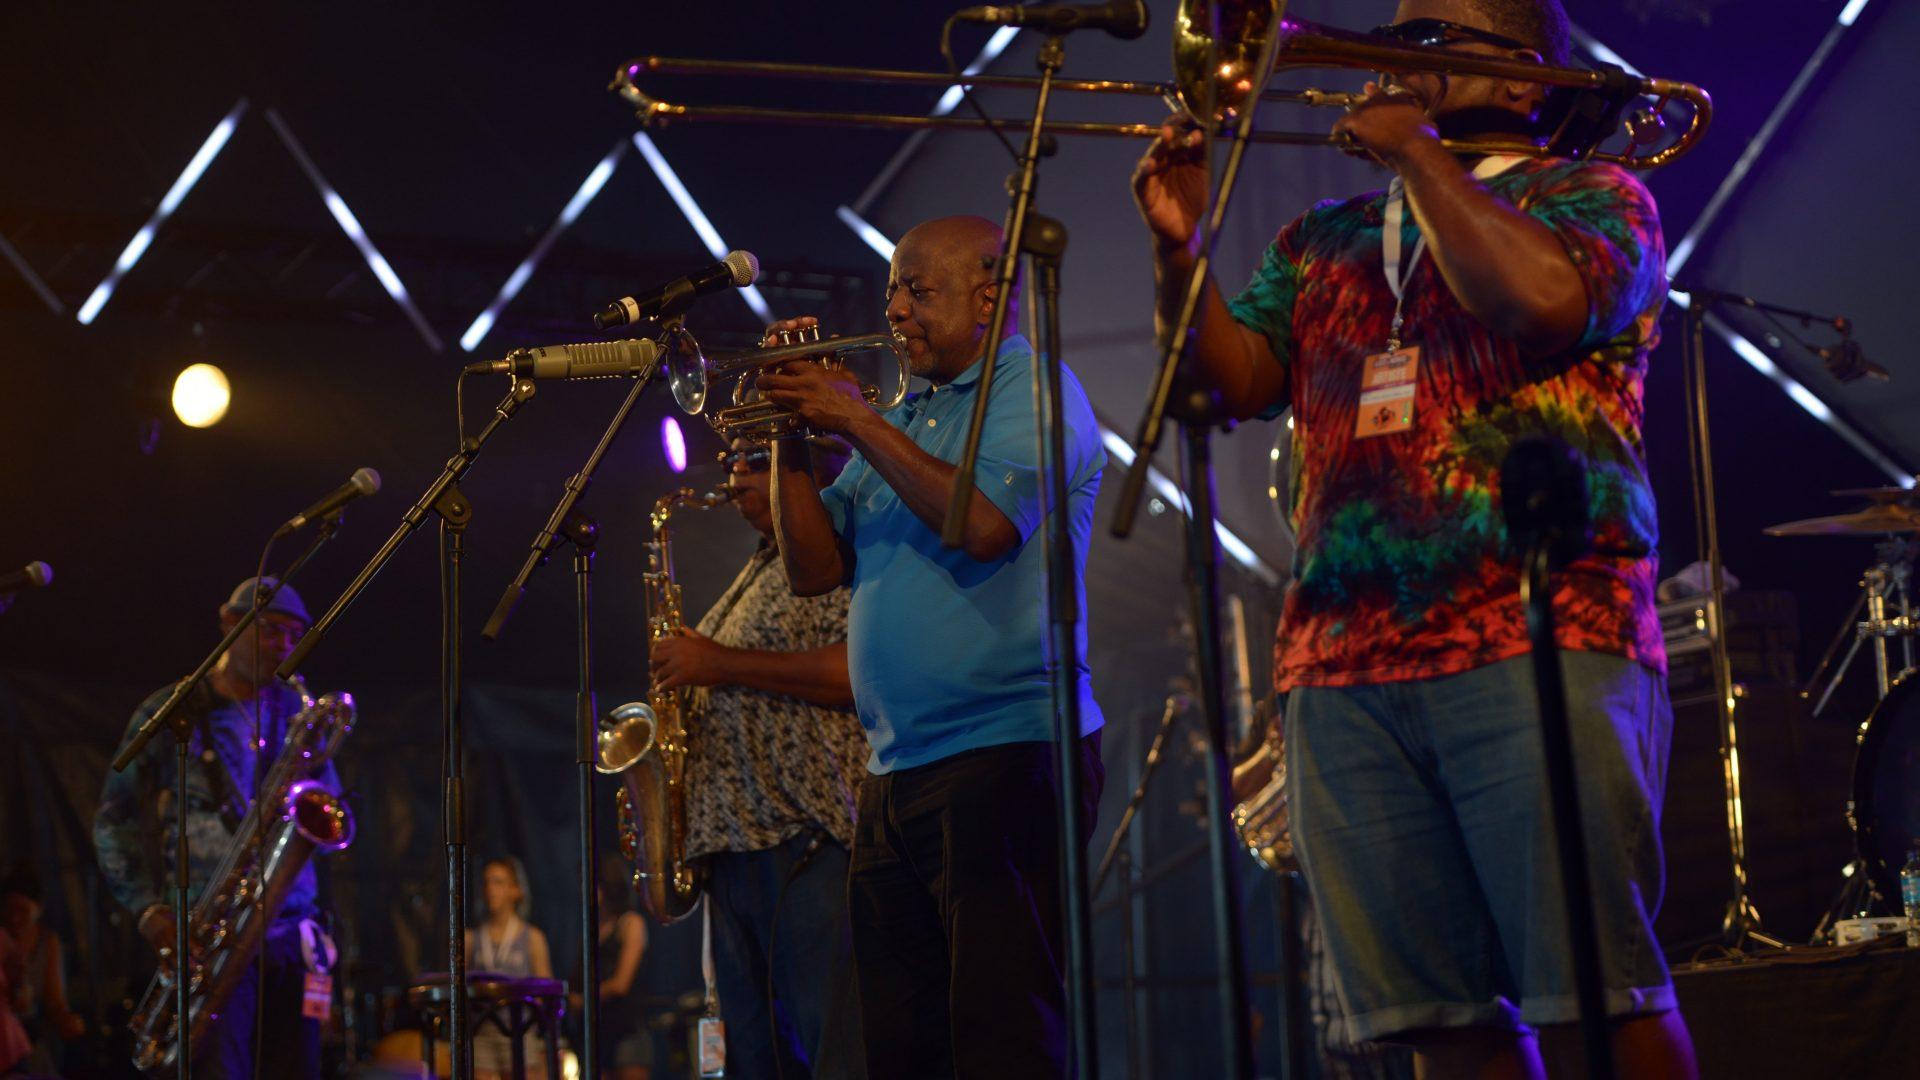 Dirty Dozen Brass Band - Festival du Bout du Monde - photo ehyobro